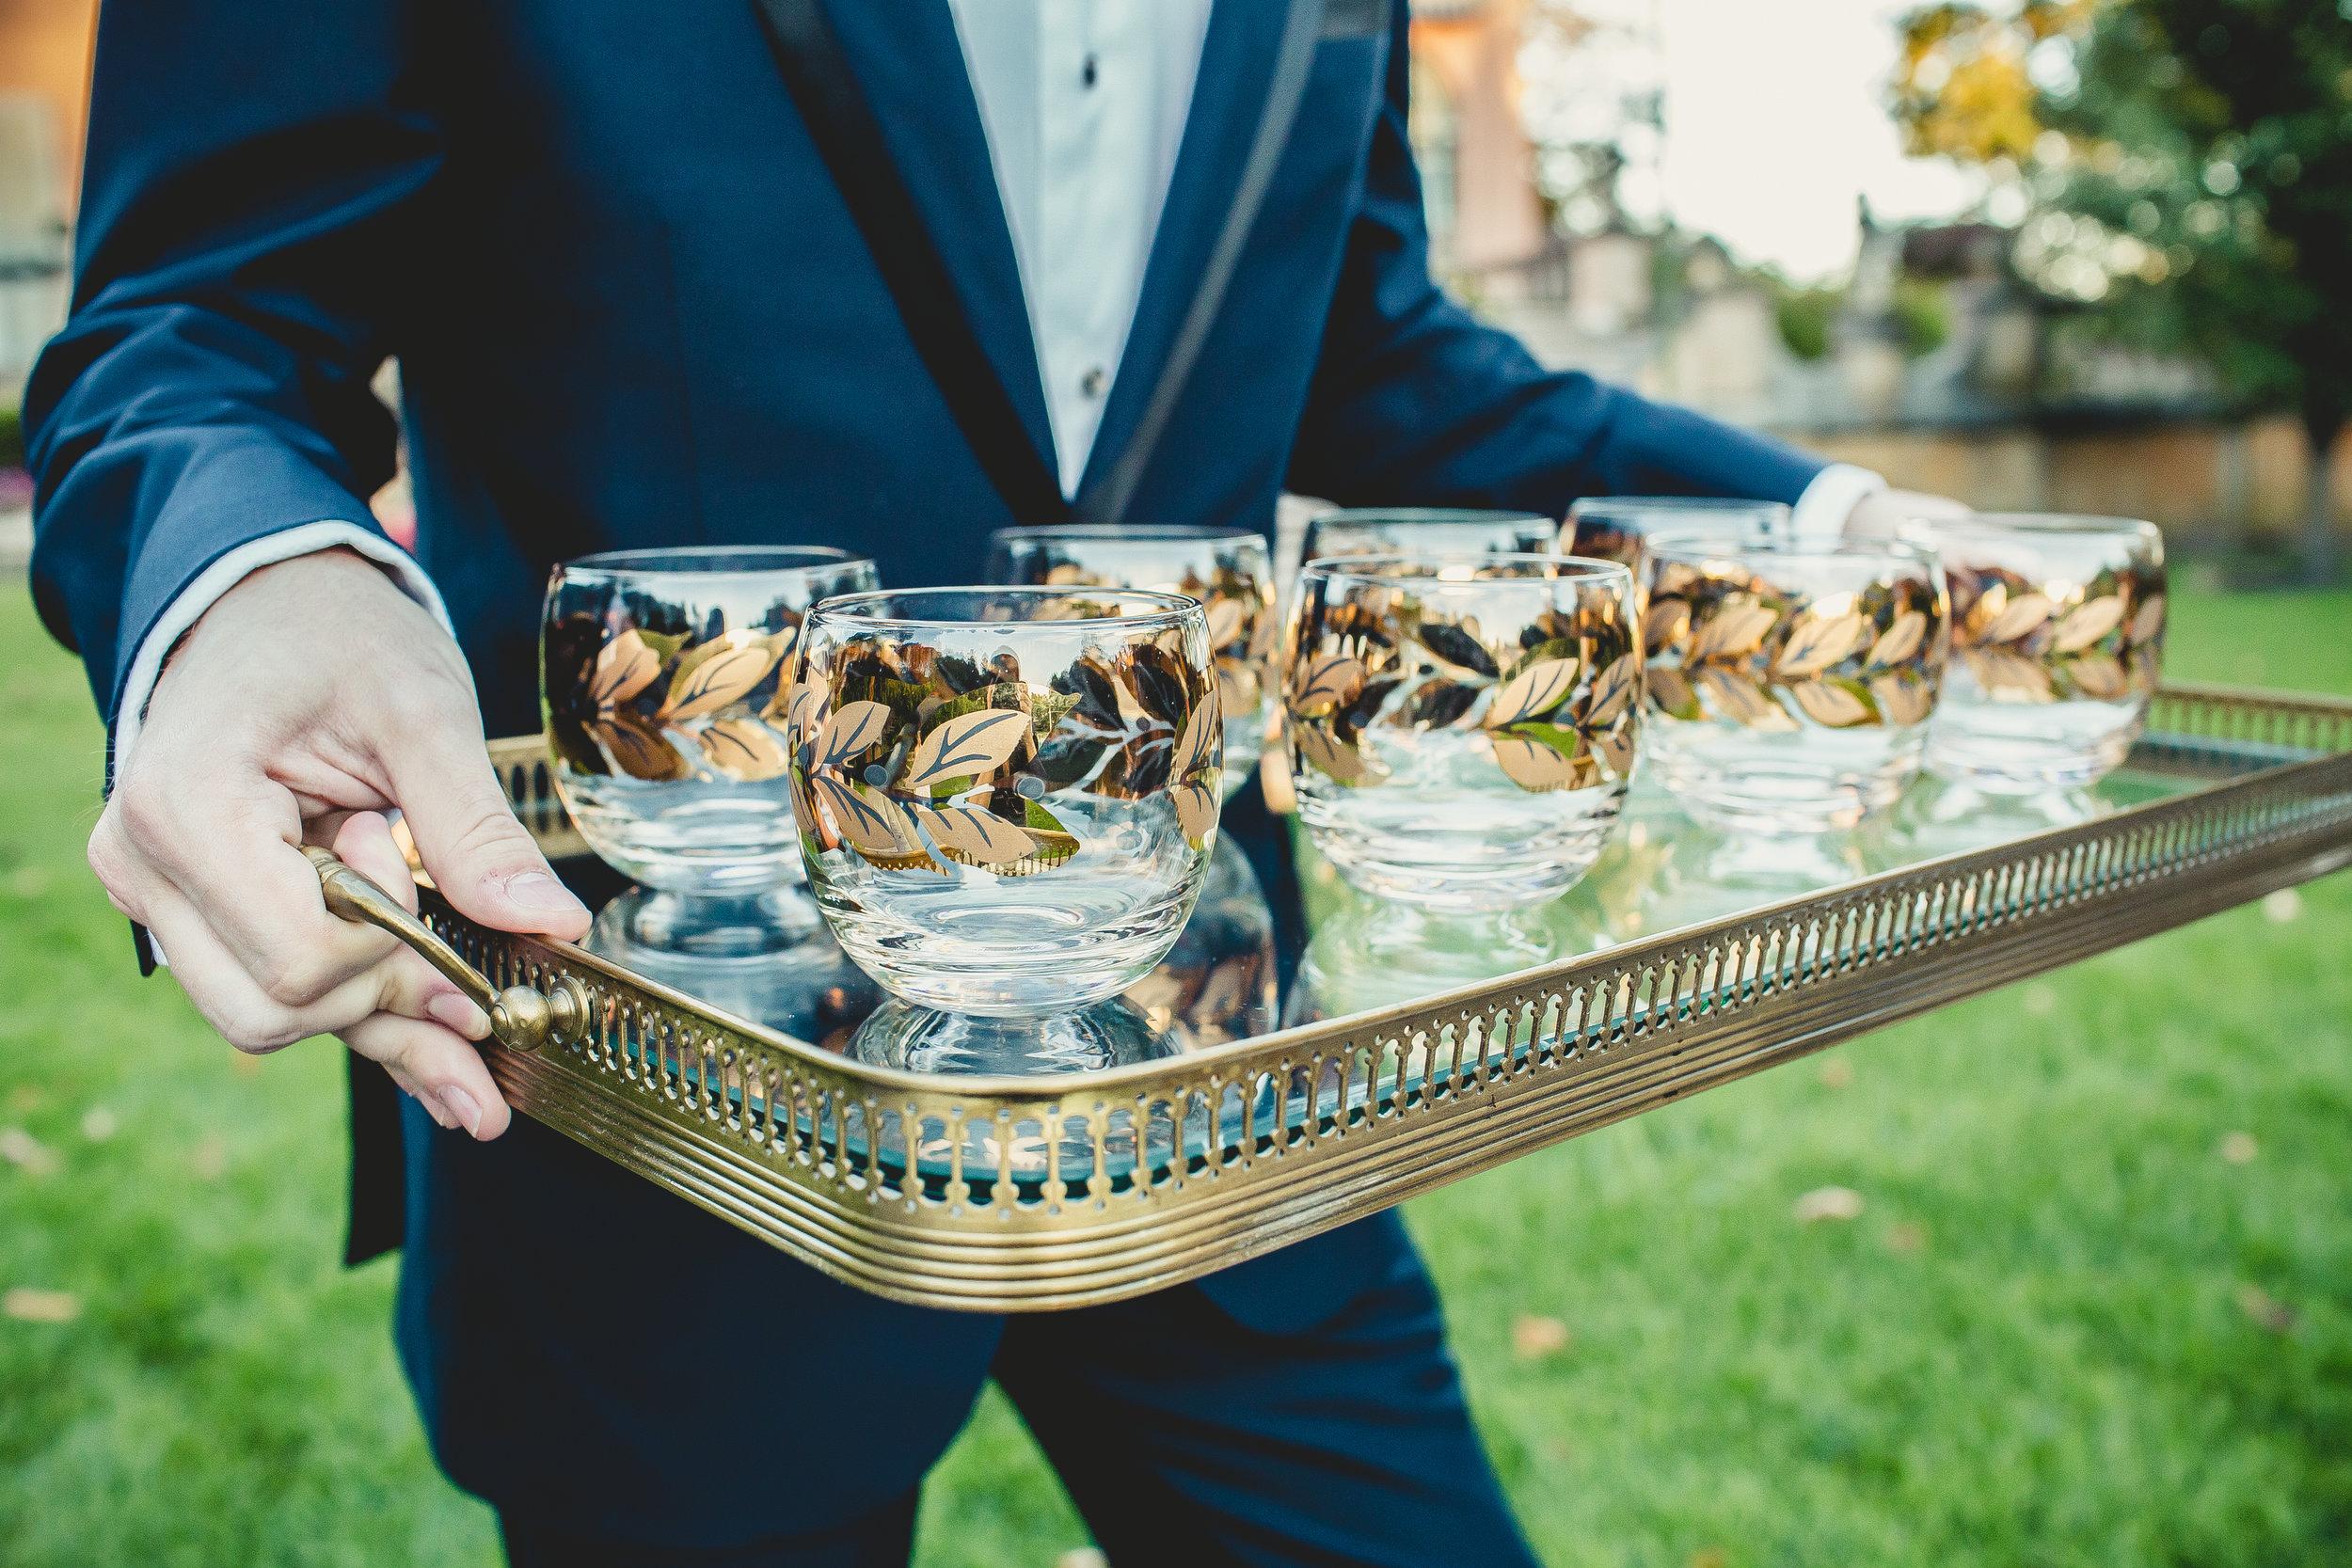 chicago-illinois-luxury-vintage-party-event-rental